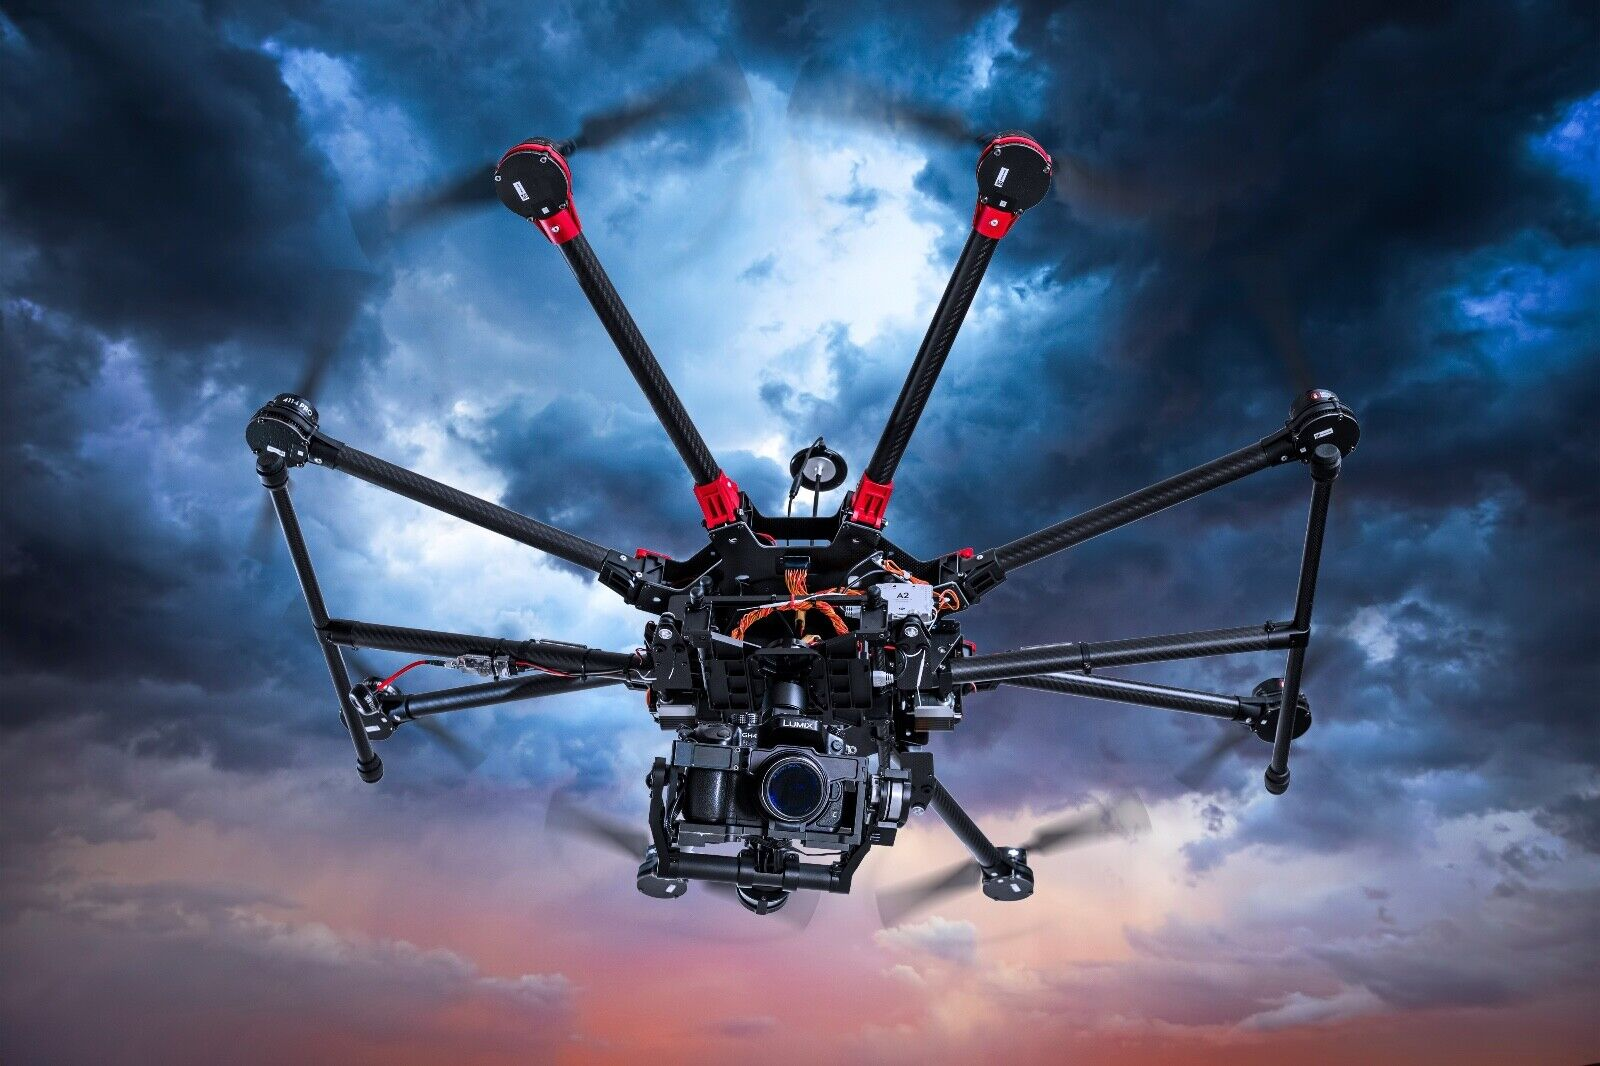 DJI S1000+ Profi Oktokopter-Drohne mit ZENMUSE Z15 GH4 Gimbal + A2-Controller